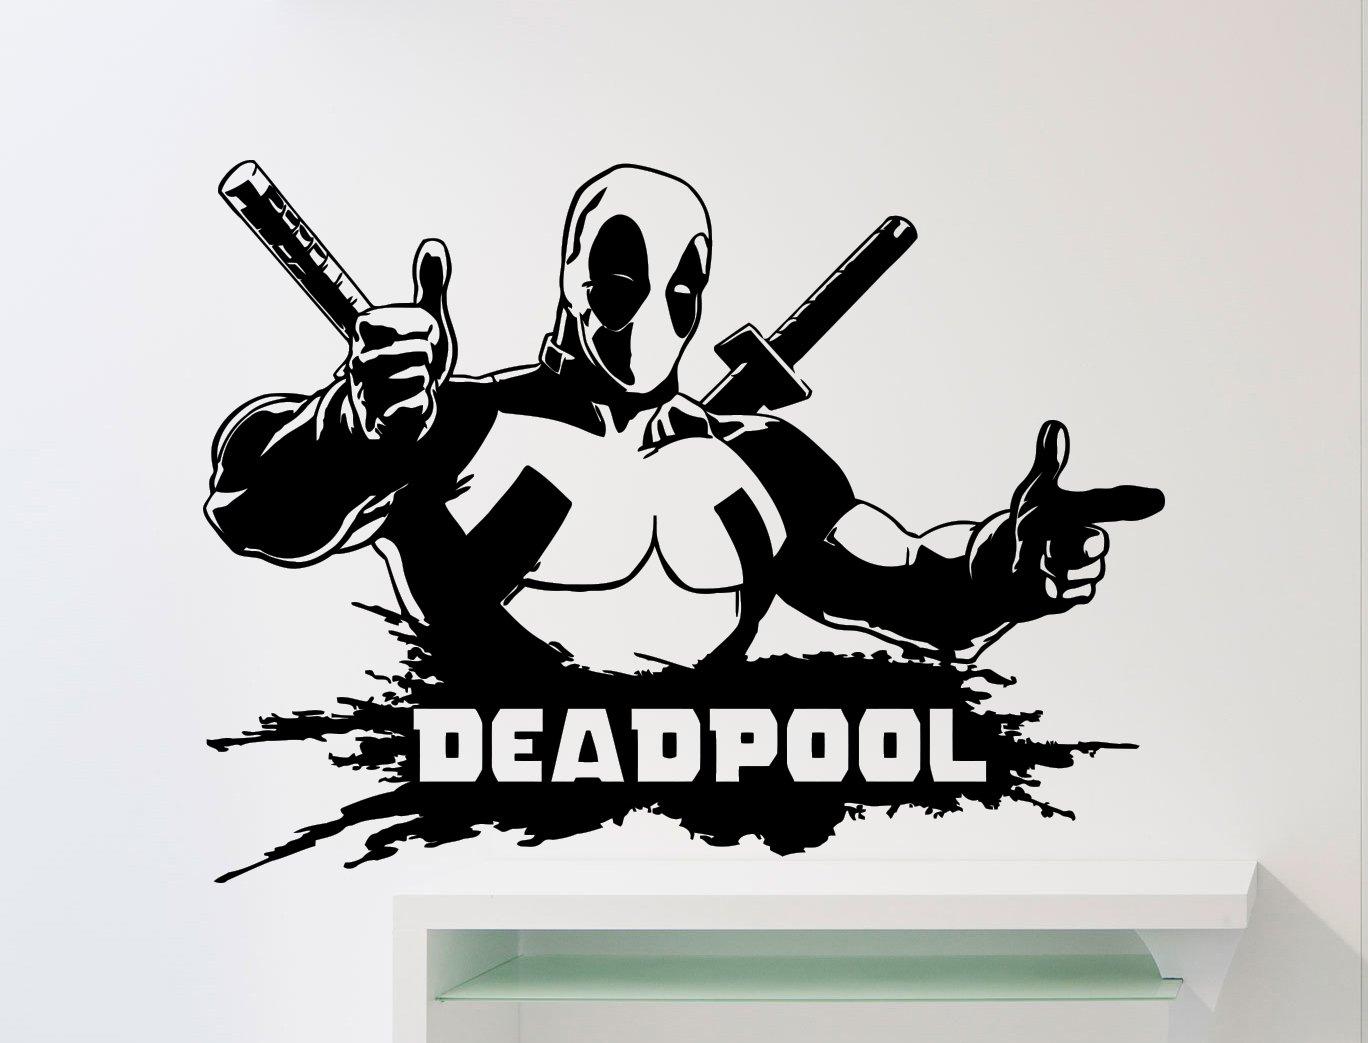 Deadpool Wall Decal Superhero DC Marvel Comics Vinyl Sticker Home Nursery Kids Boy Girl Room Interior Art Decoration Any Room Mural Waterproof Vinyl Sticker (276su)